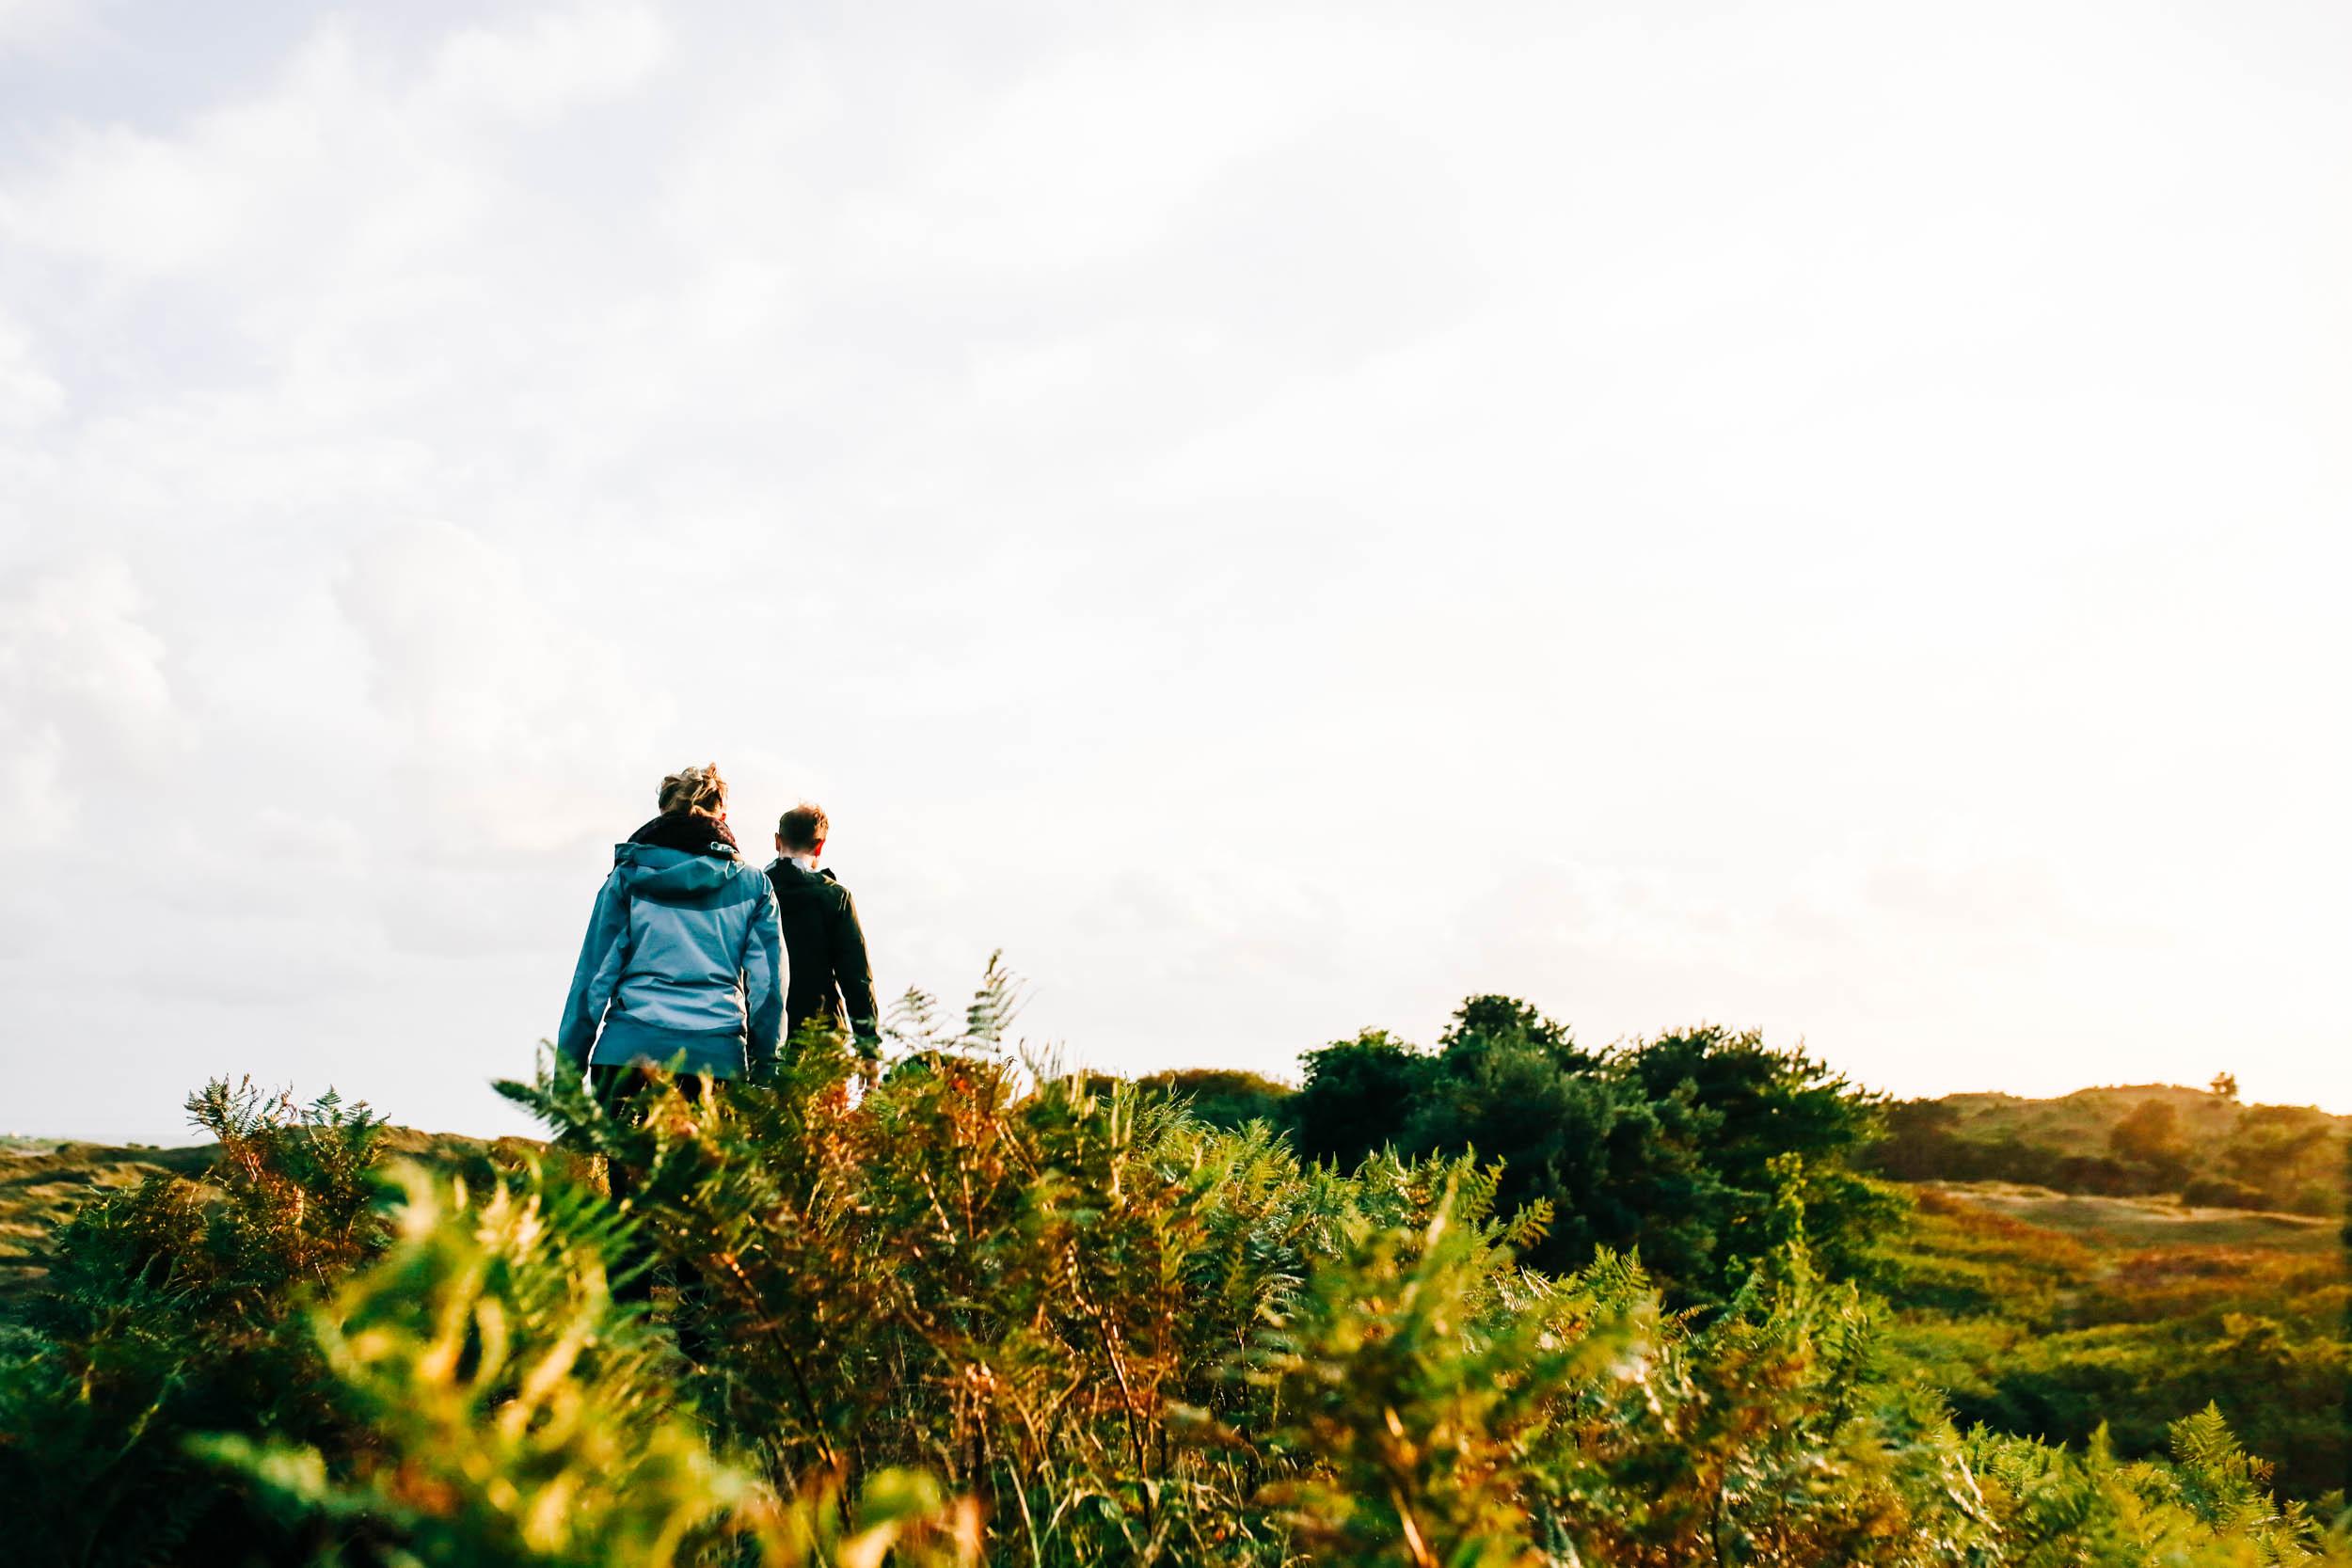 Alex_Sedgmond_Photography-MerthyrMawr-PreweddingPhotography-Penny&Mike-34.jpg